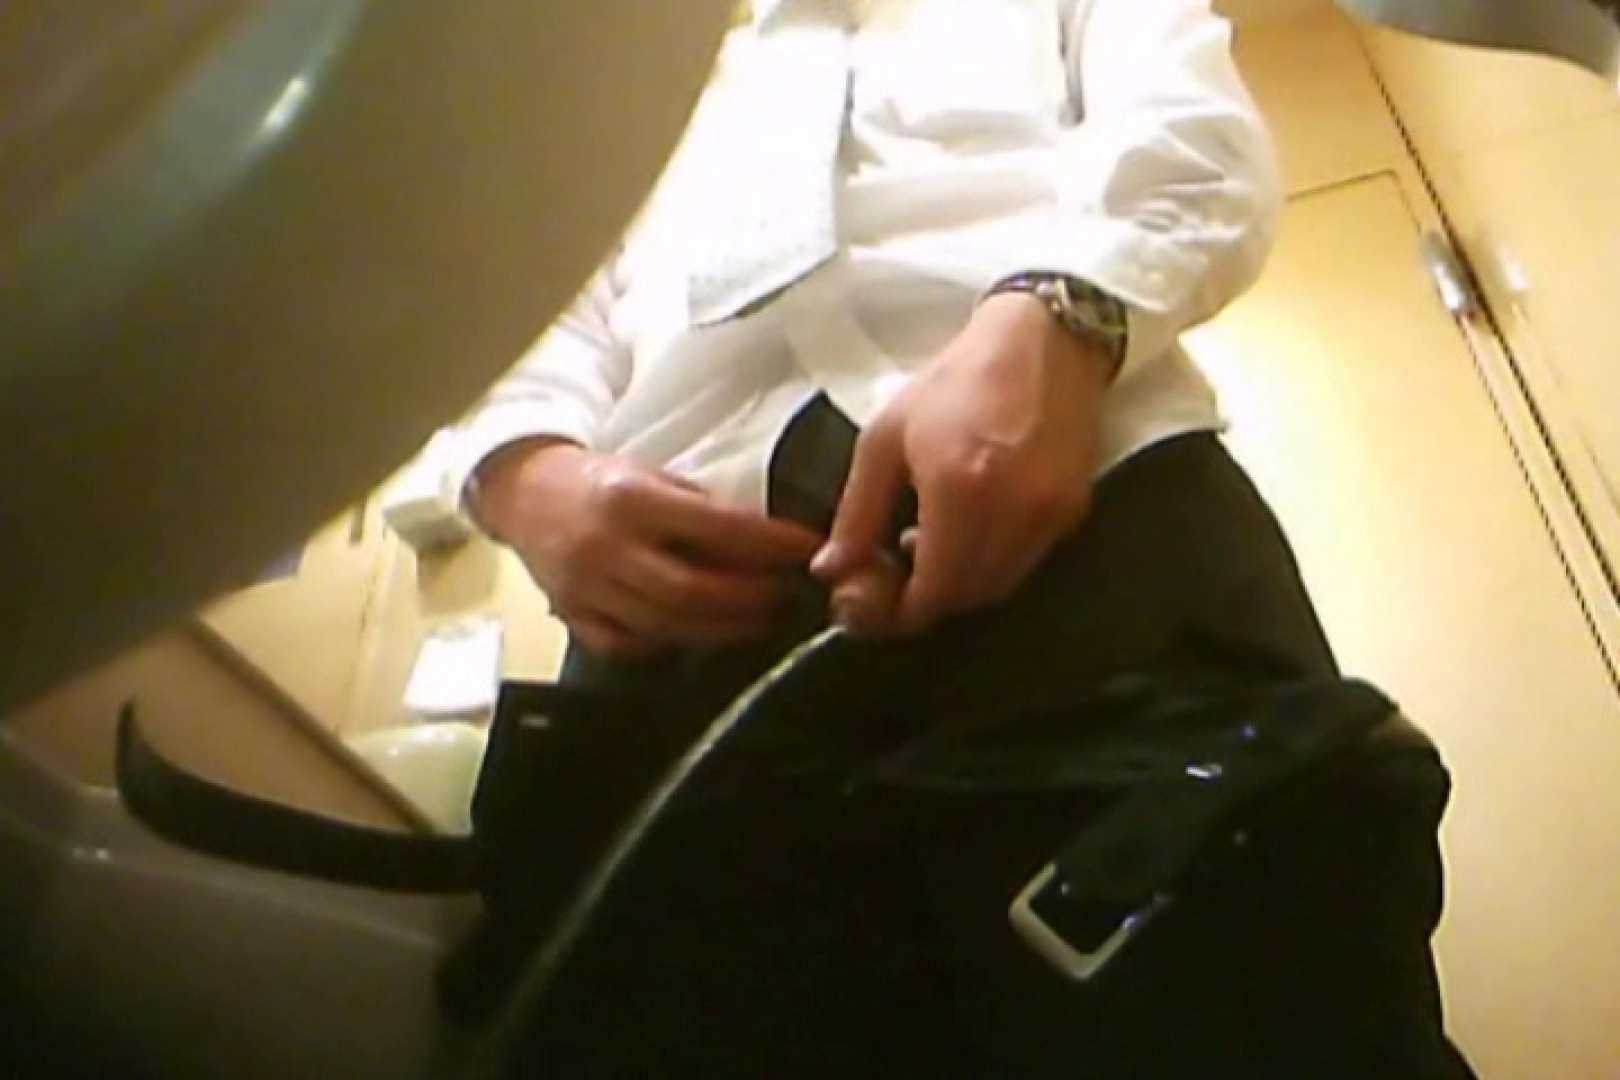 SEASON 3rd!掴み取りさんの洗面所覗き!in新幹線!VOL.20 私服 ゲイ射精画像 96連発 75